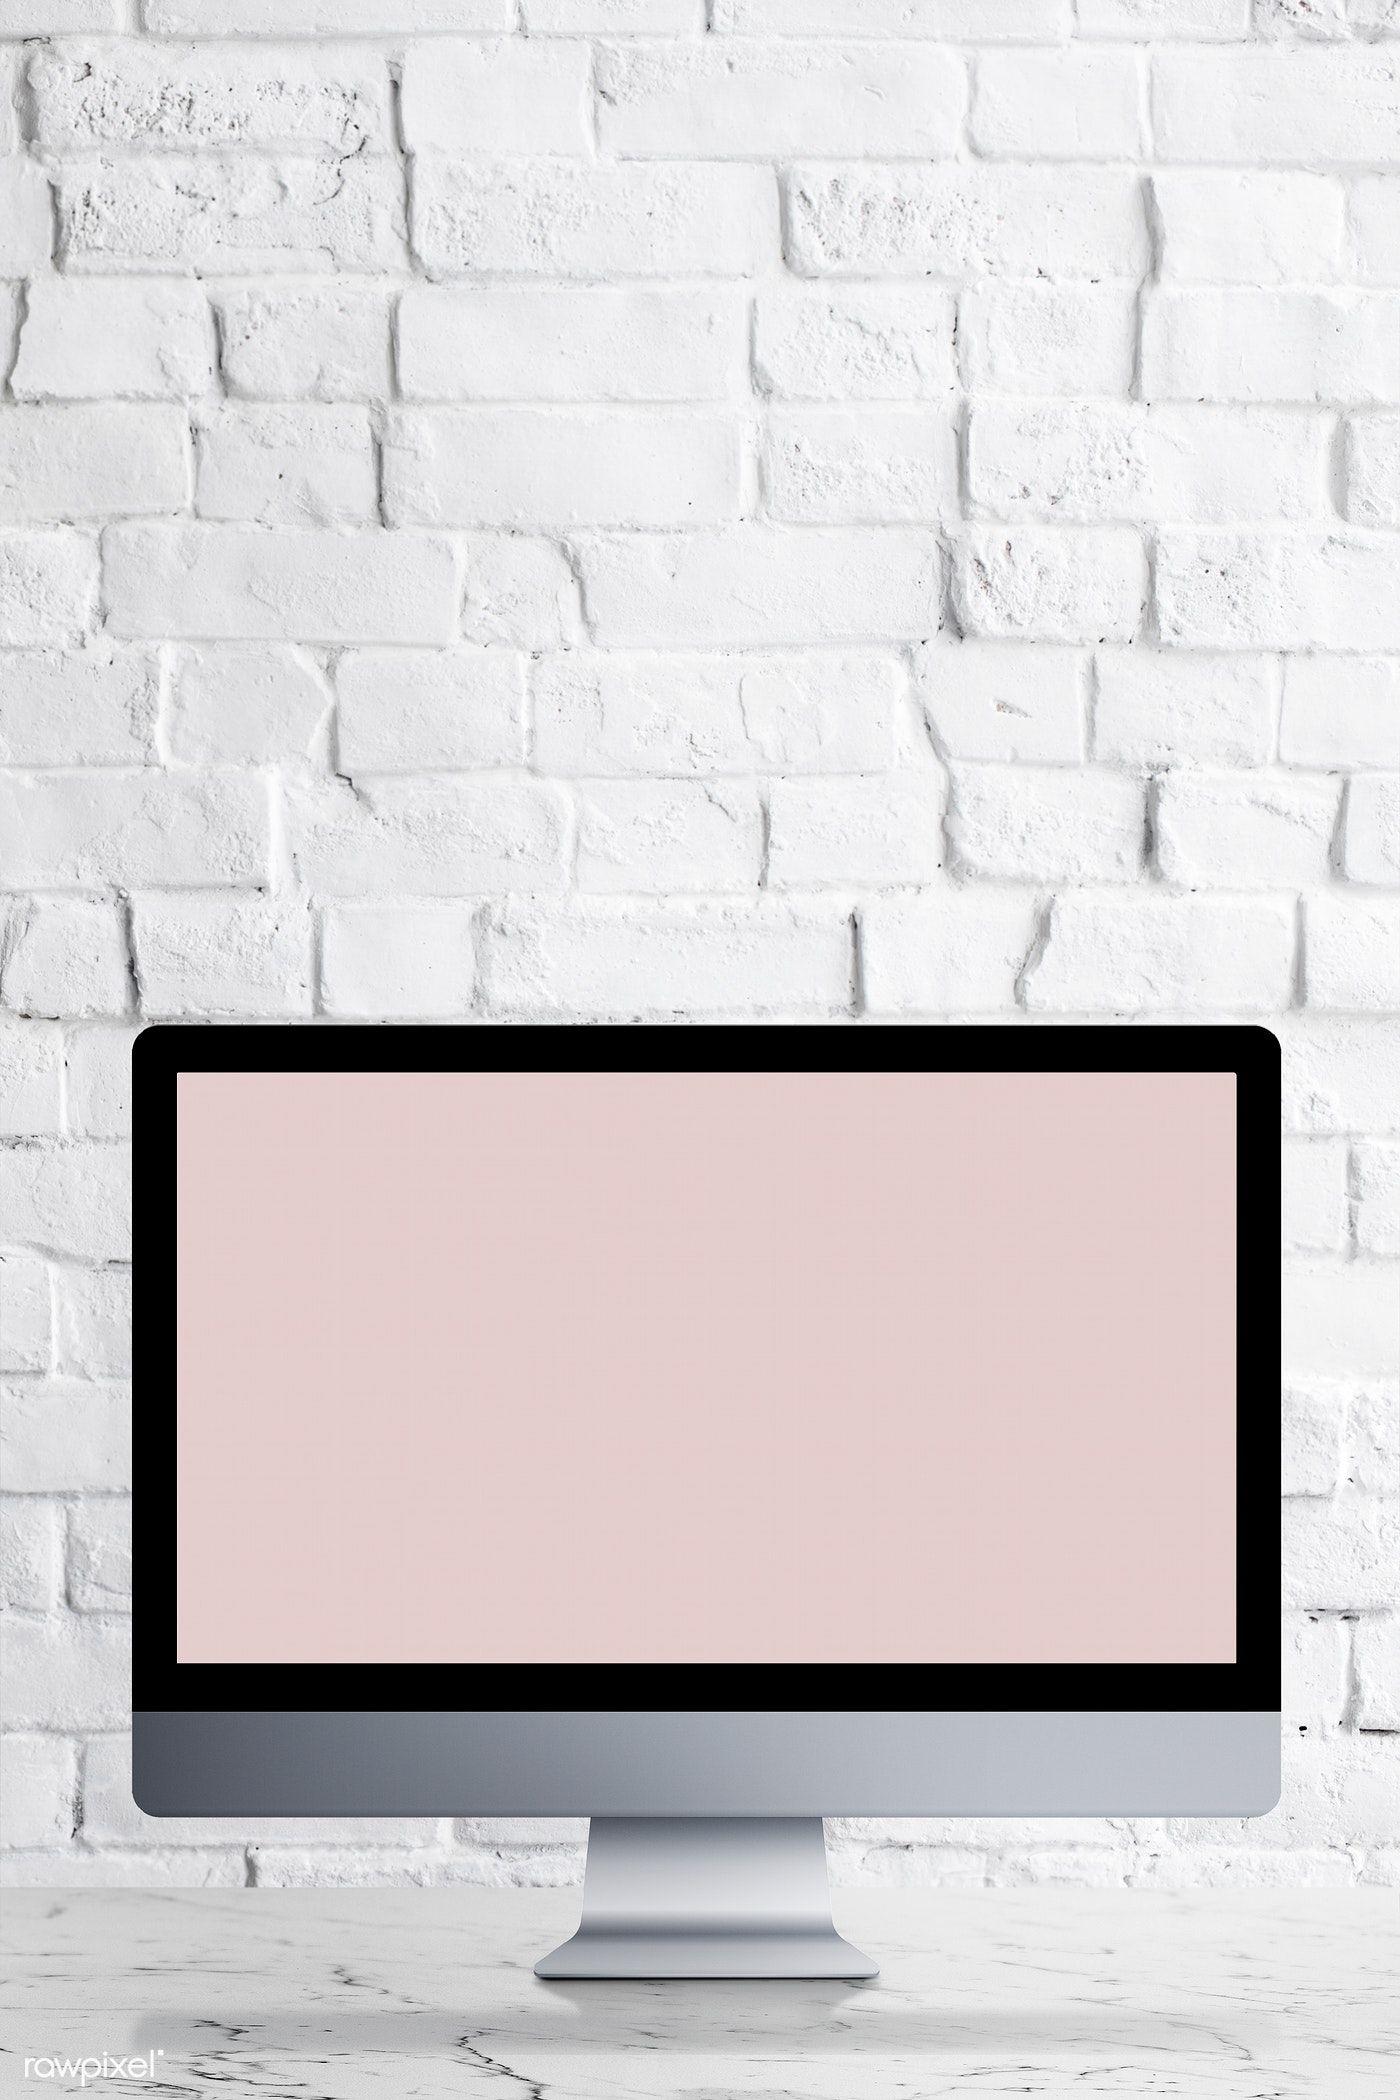 Download Premium Psd Of Desktop Computer With Screen Mockup On A White Ideias Instagram Papel De Parede Fofinhos Ideias